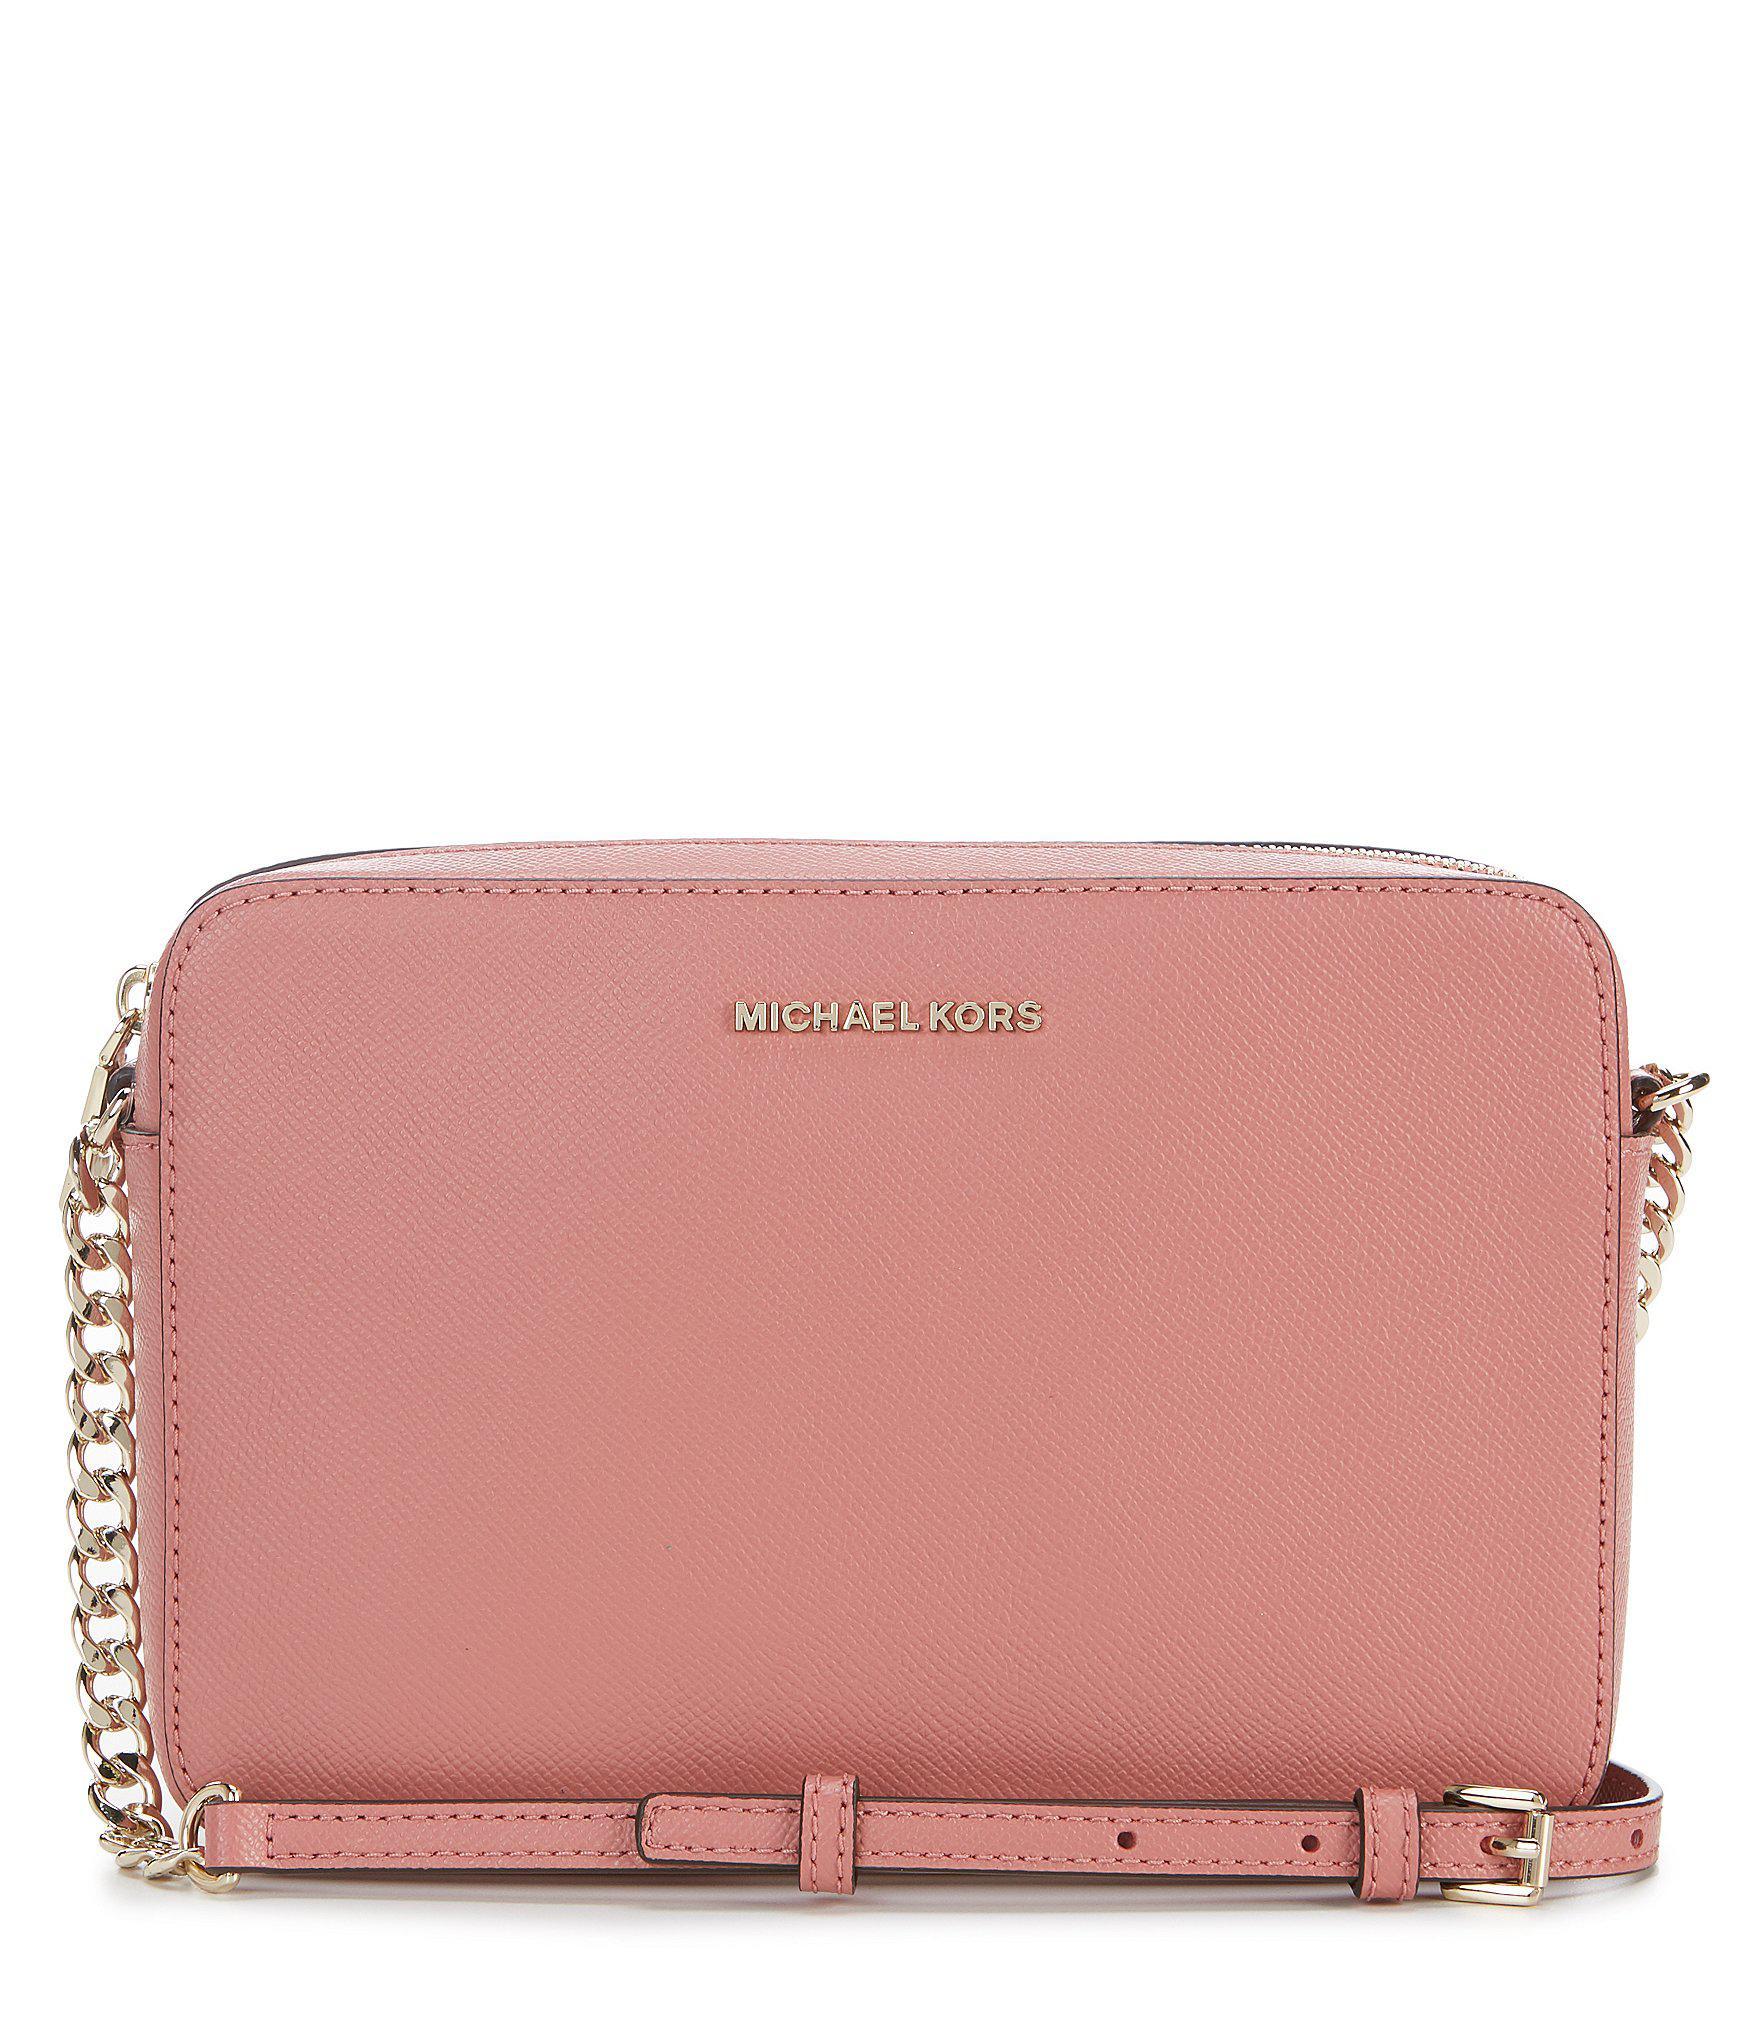 8647c9b2b67c93 Lyst - MICHAEL Michael Kors Large East/west Cross-body Bag in Pink